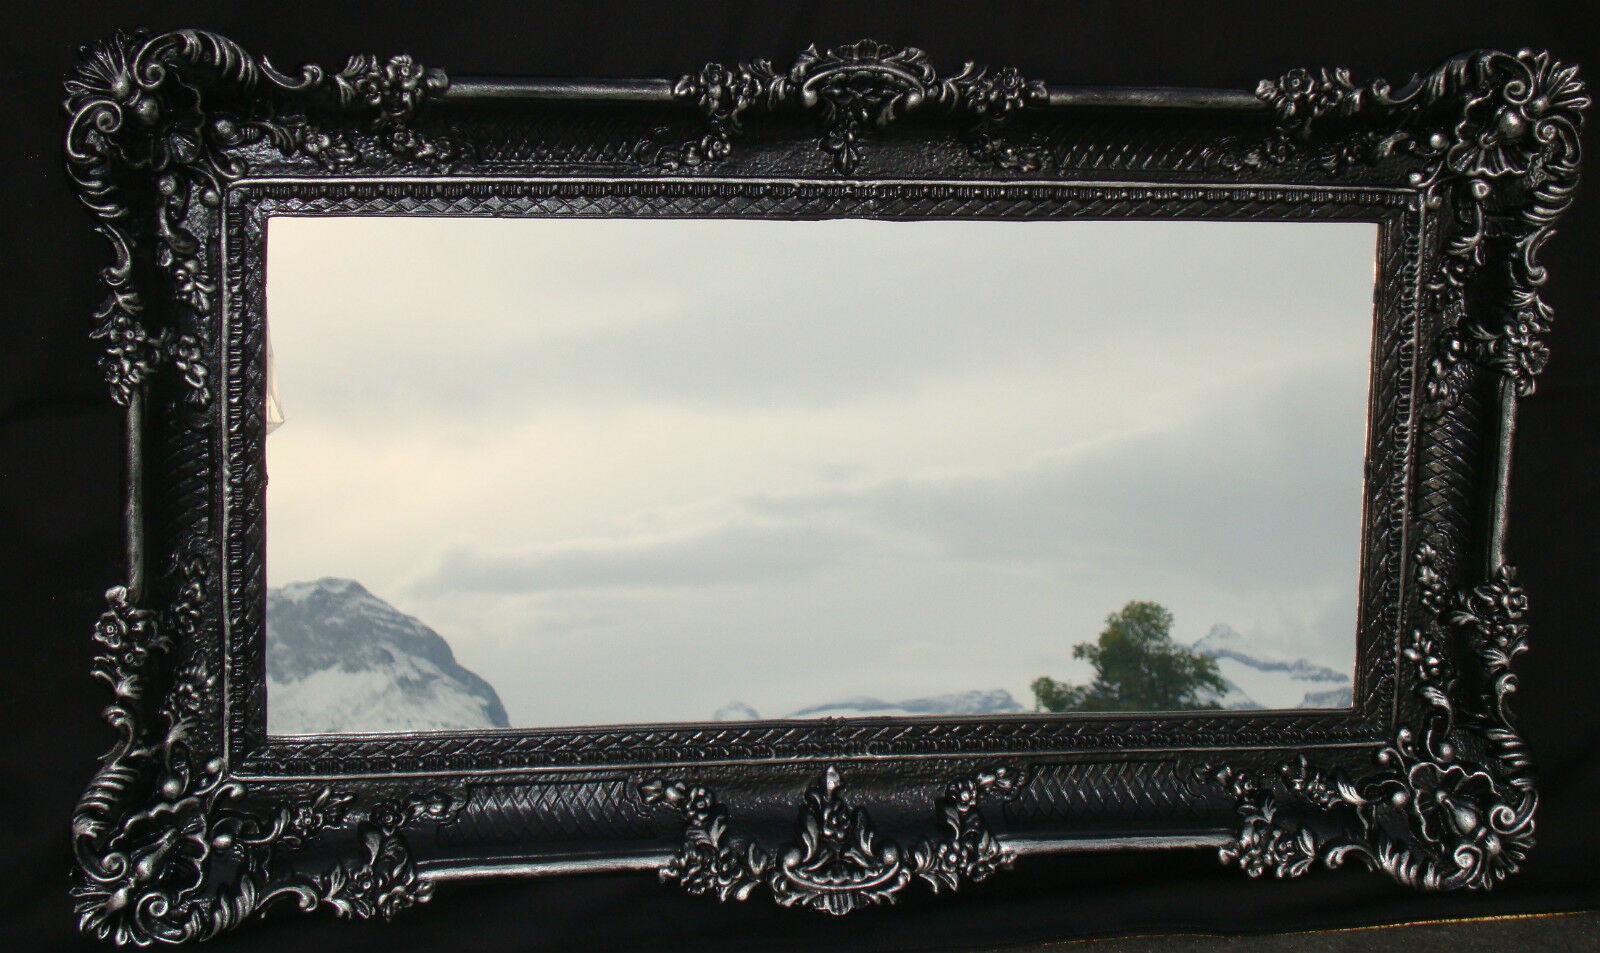 Wandspiegel Barock Antik DEKO Badspiegel, Schwarz-Silber 97x57, NEU ...